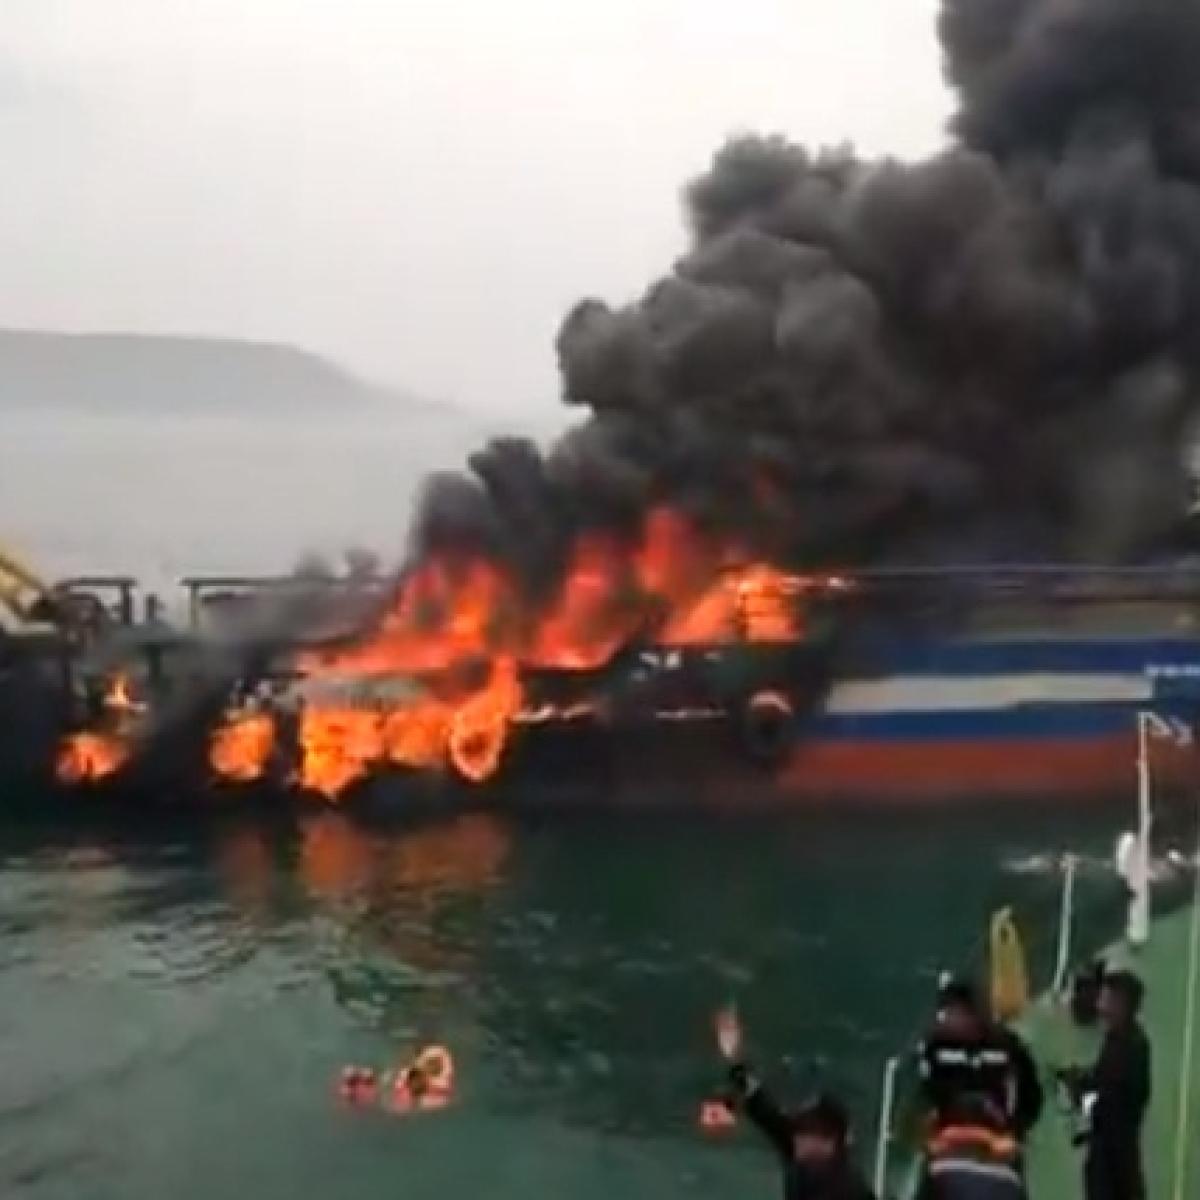 Fire engulfs Coast Guard's offshore support vessel Coastal Jaguar in Visakhapatnam; 28 rescued, 1 missing